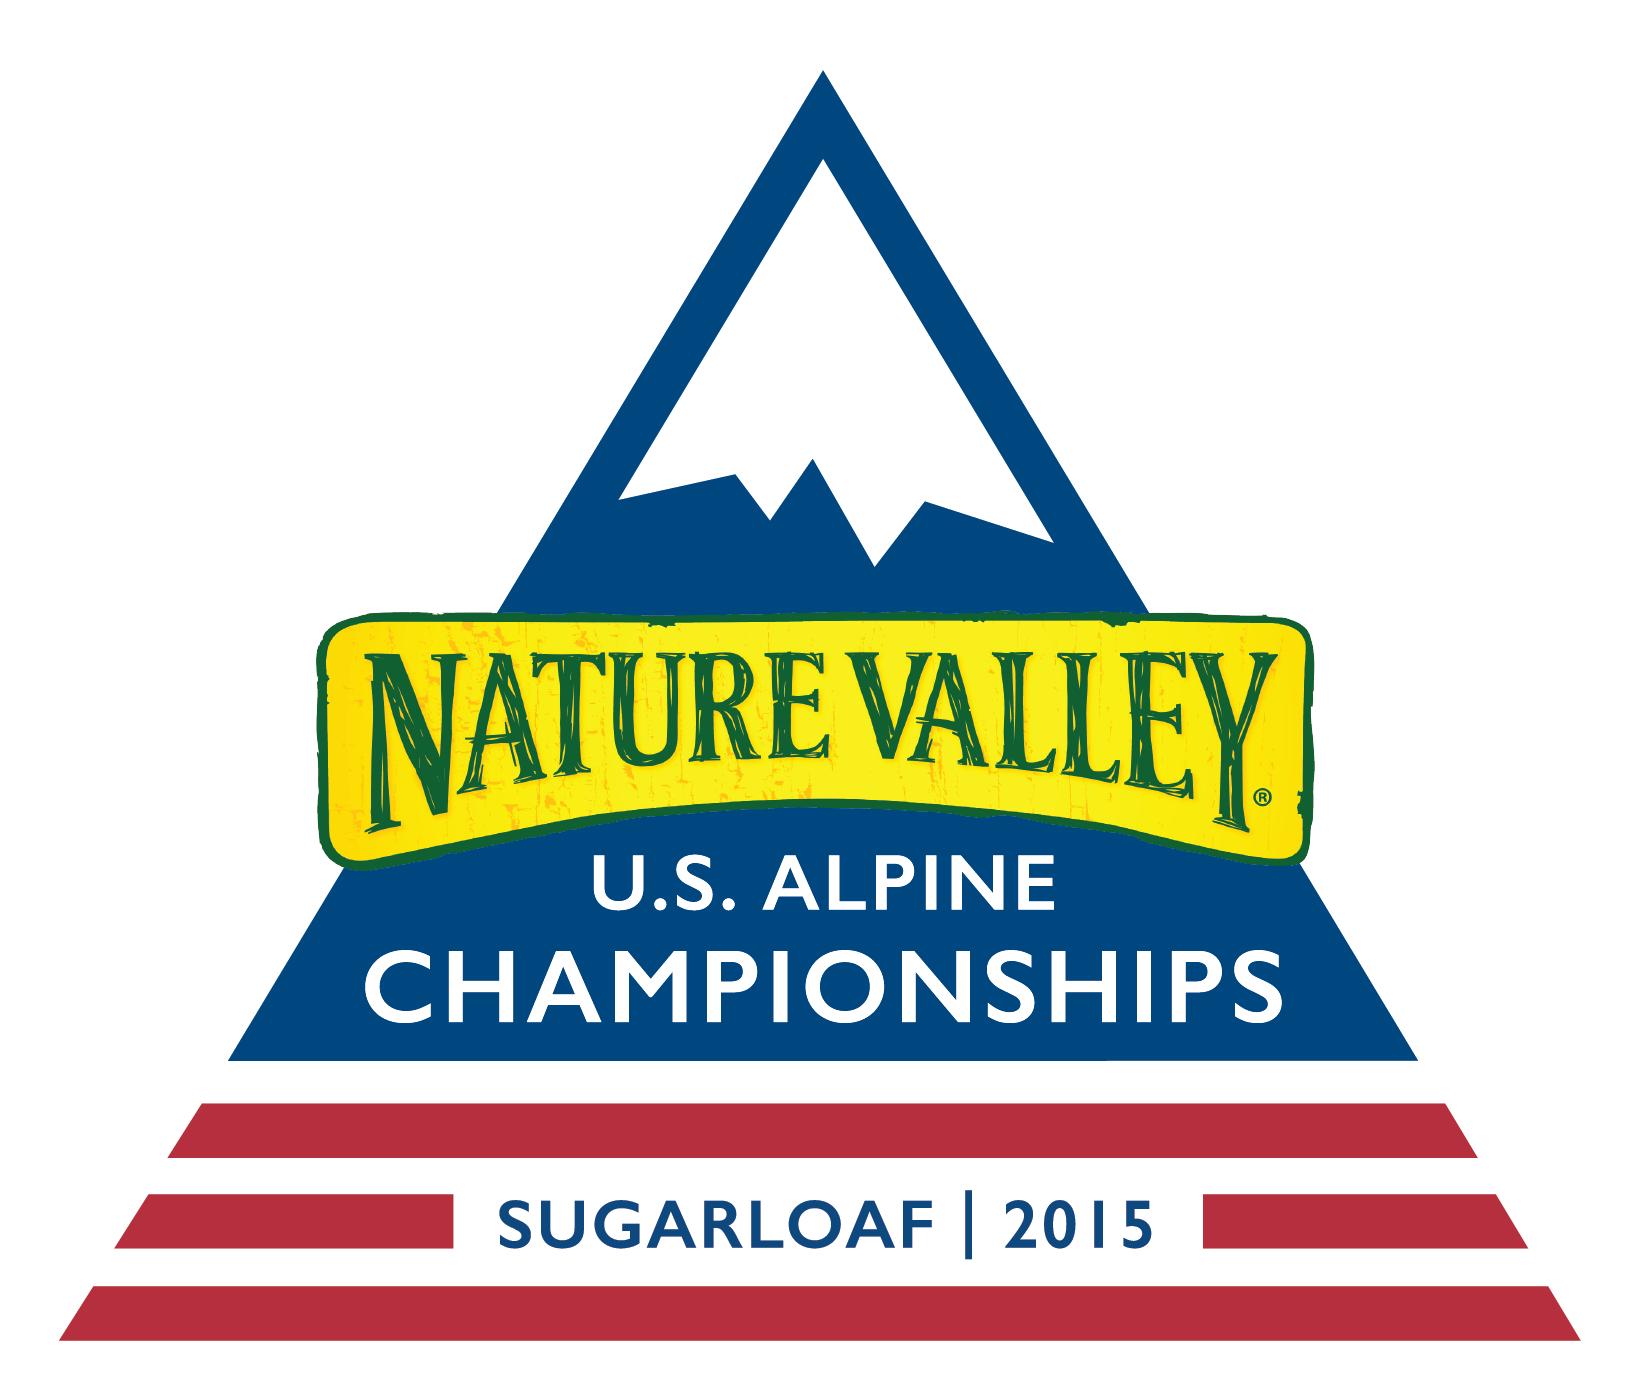 Sugarloaf US Alpine Championships 2015 Logo